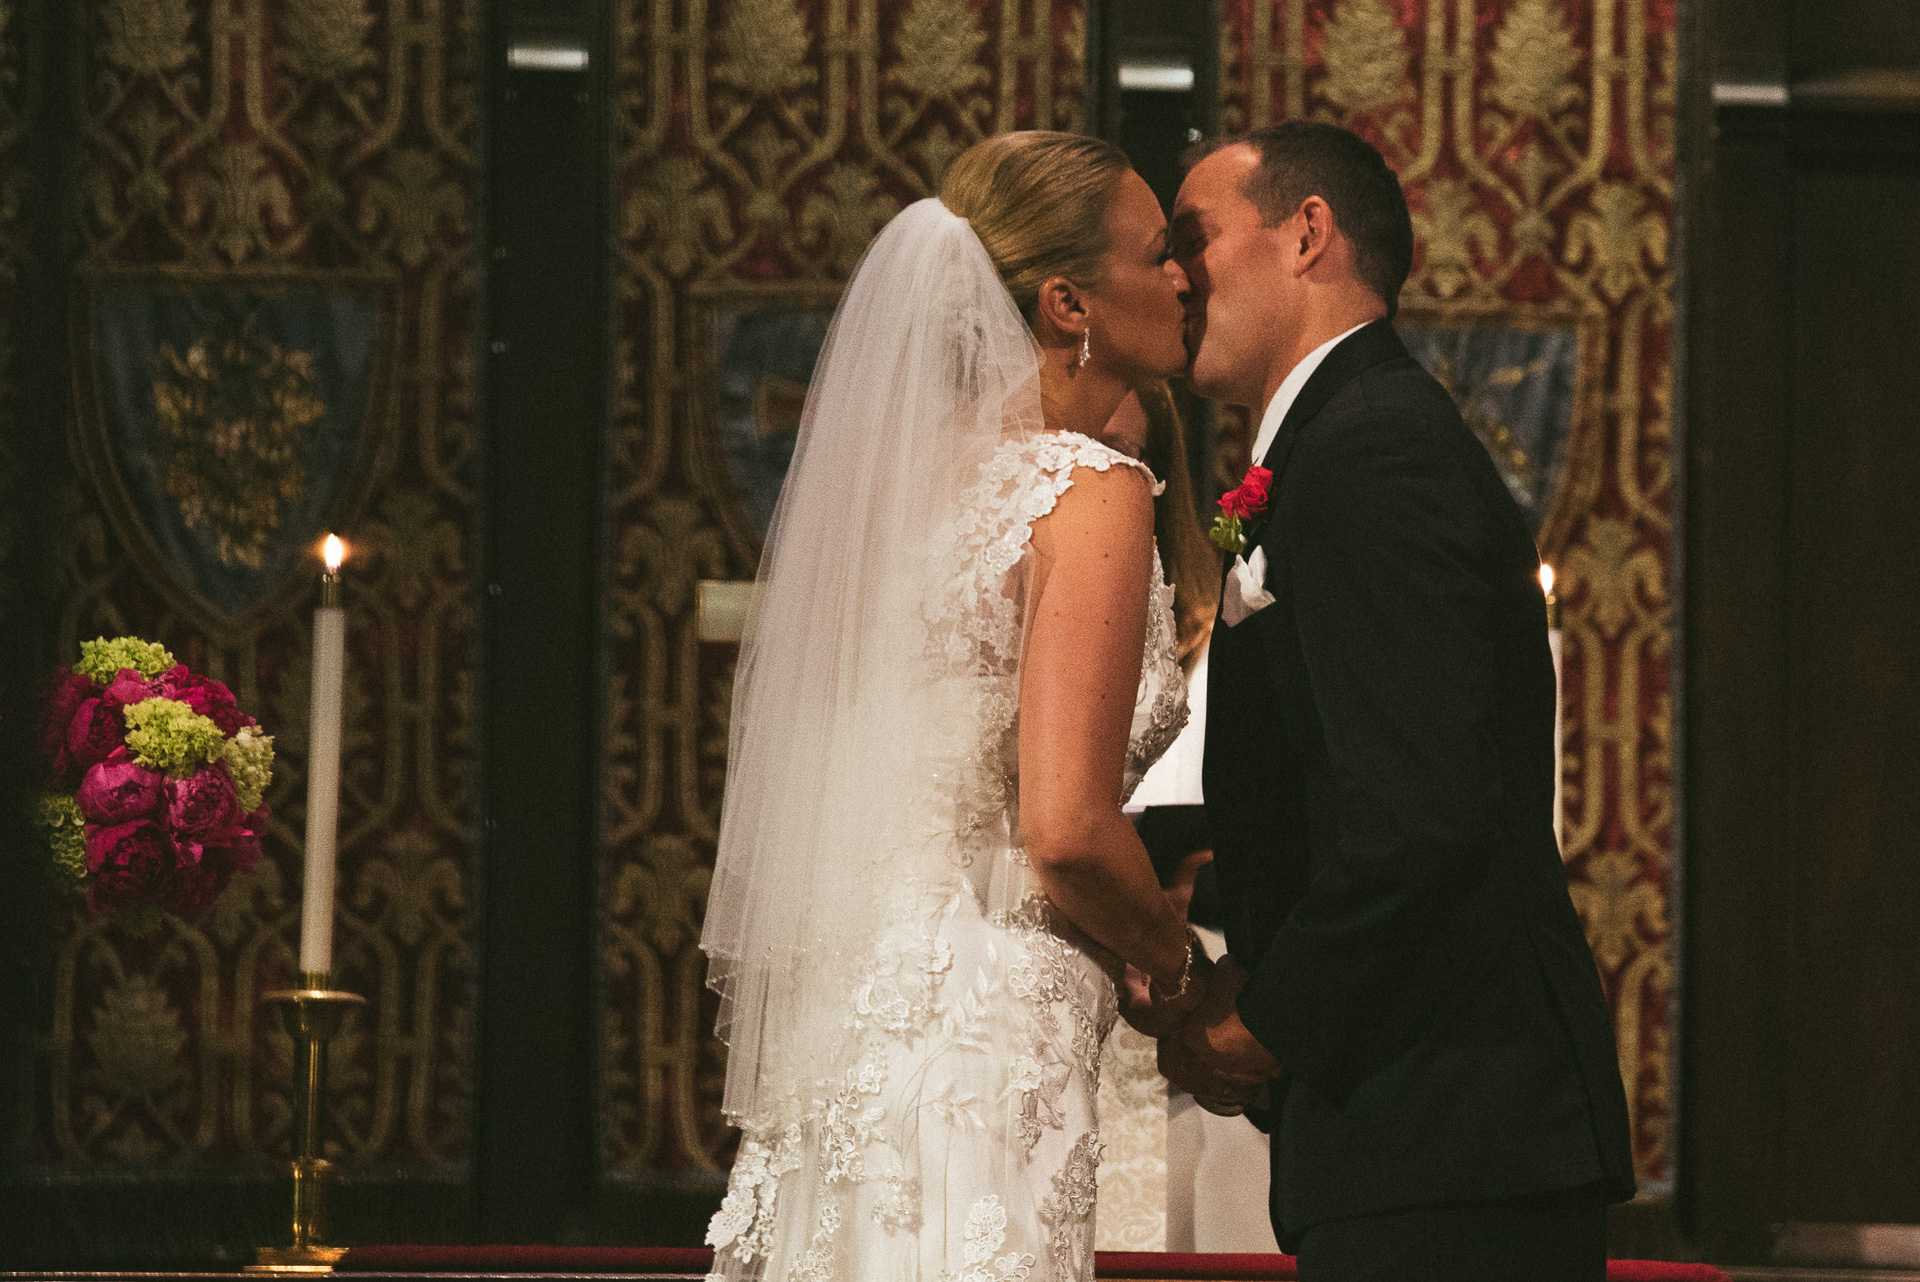 Dayton Wedding Photographer - Couple kiss